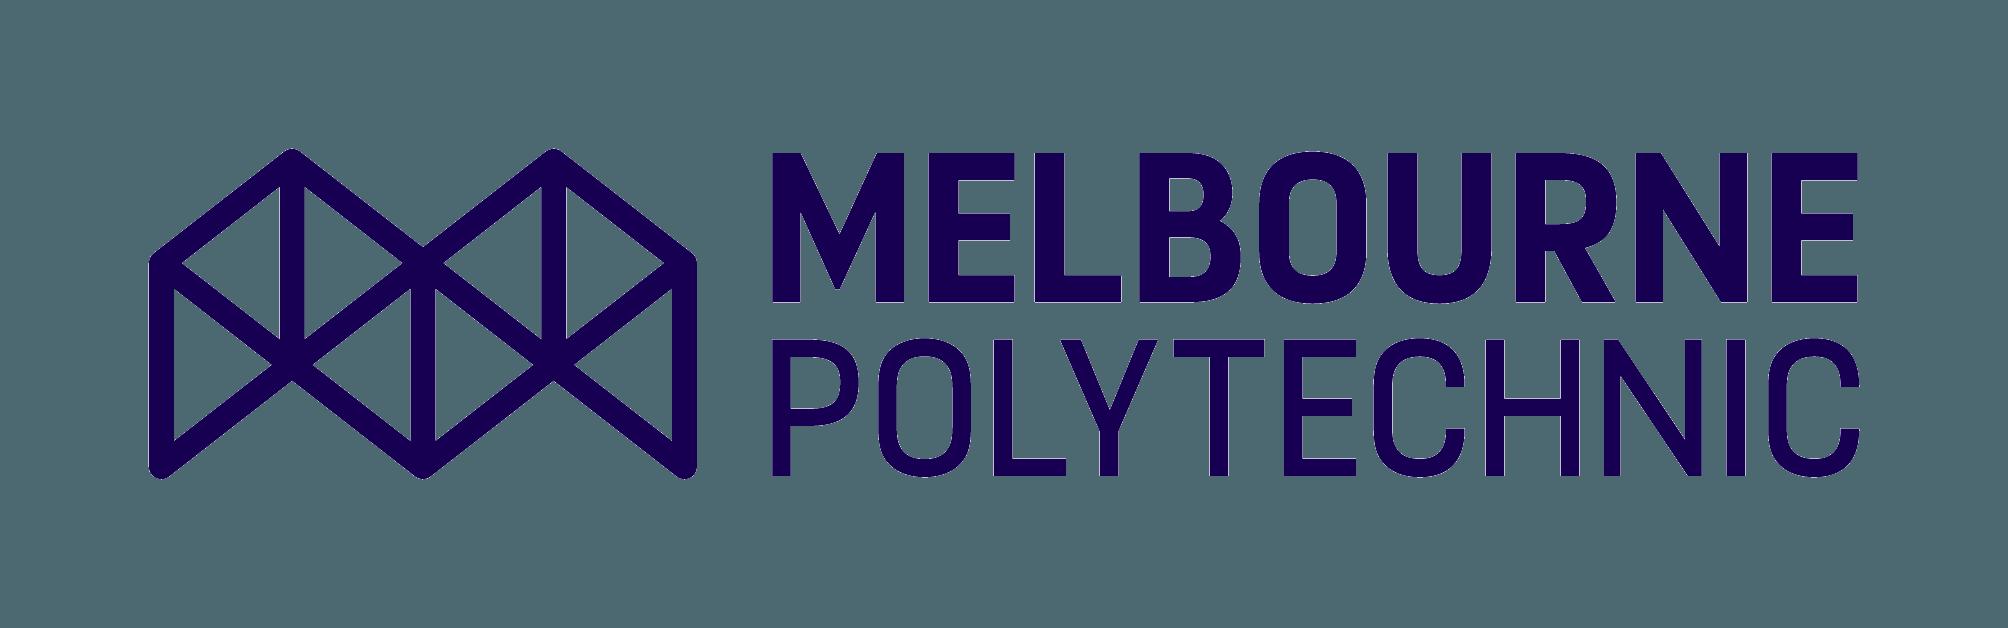 https://www.melbournepolytechnic.edu.au/